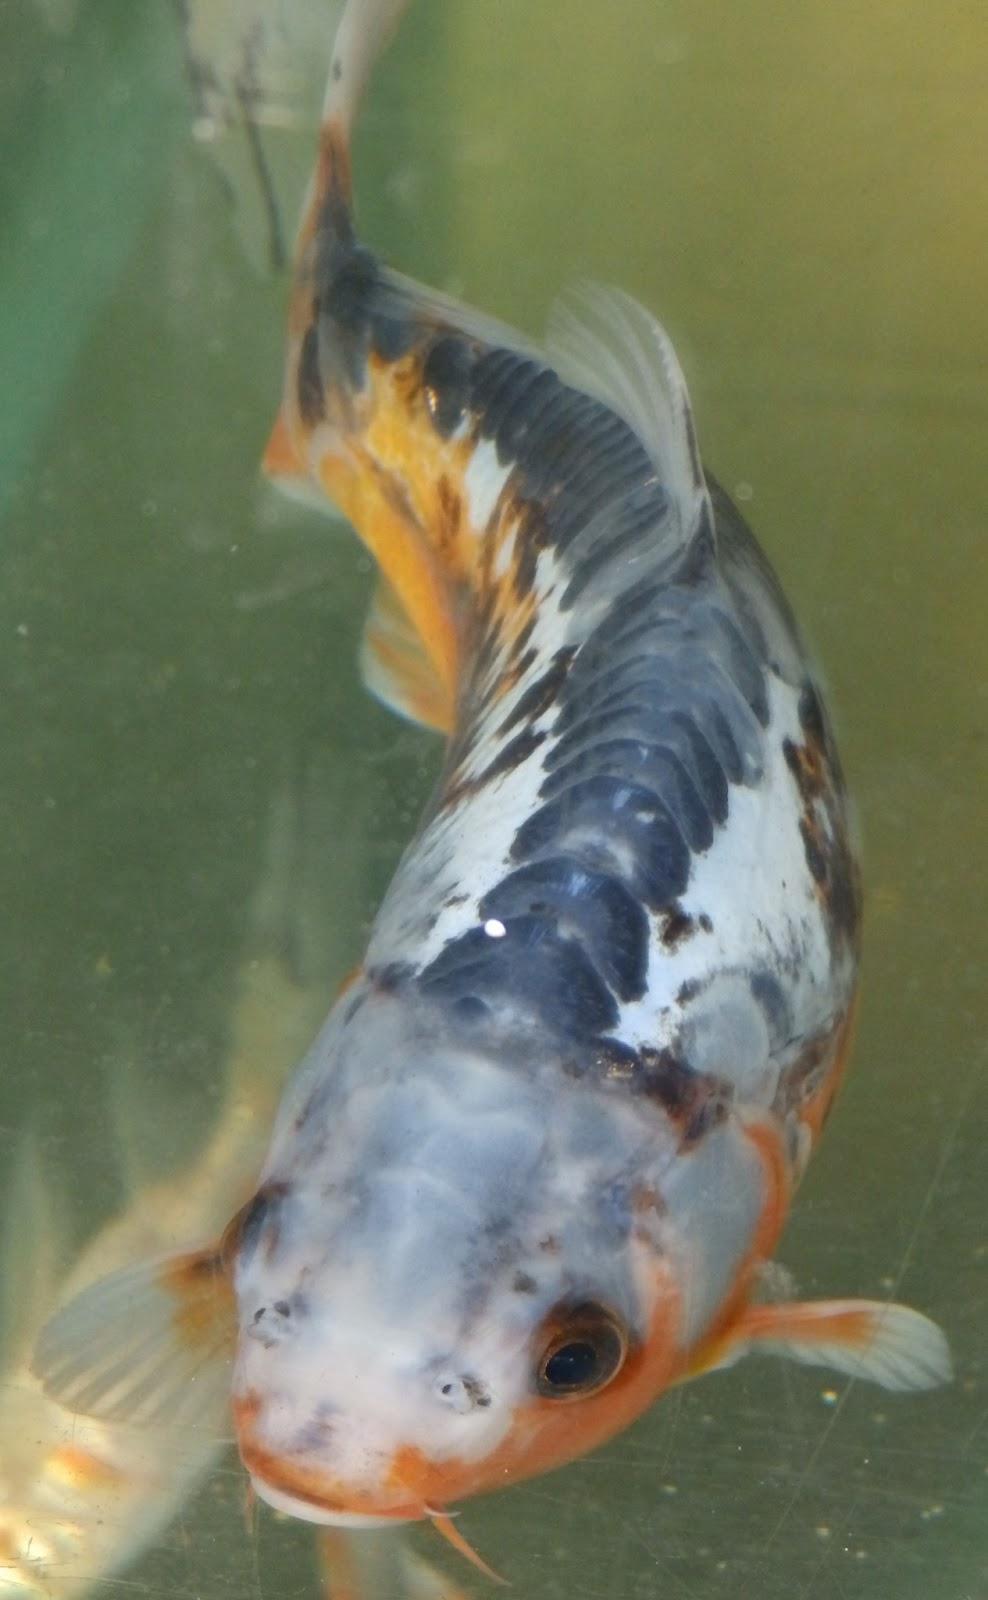 reptiles amphibians fish the blue orange shusui koi carp. Black Bedroom Furniture Sets. Home Design Ideas